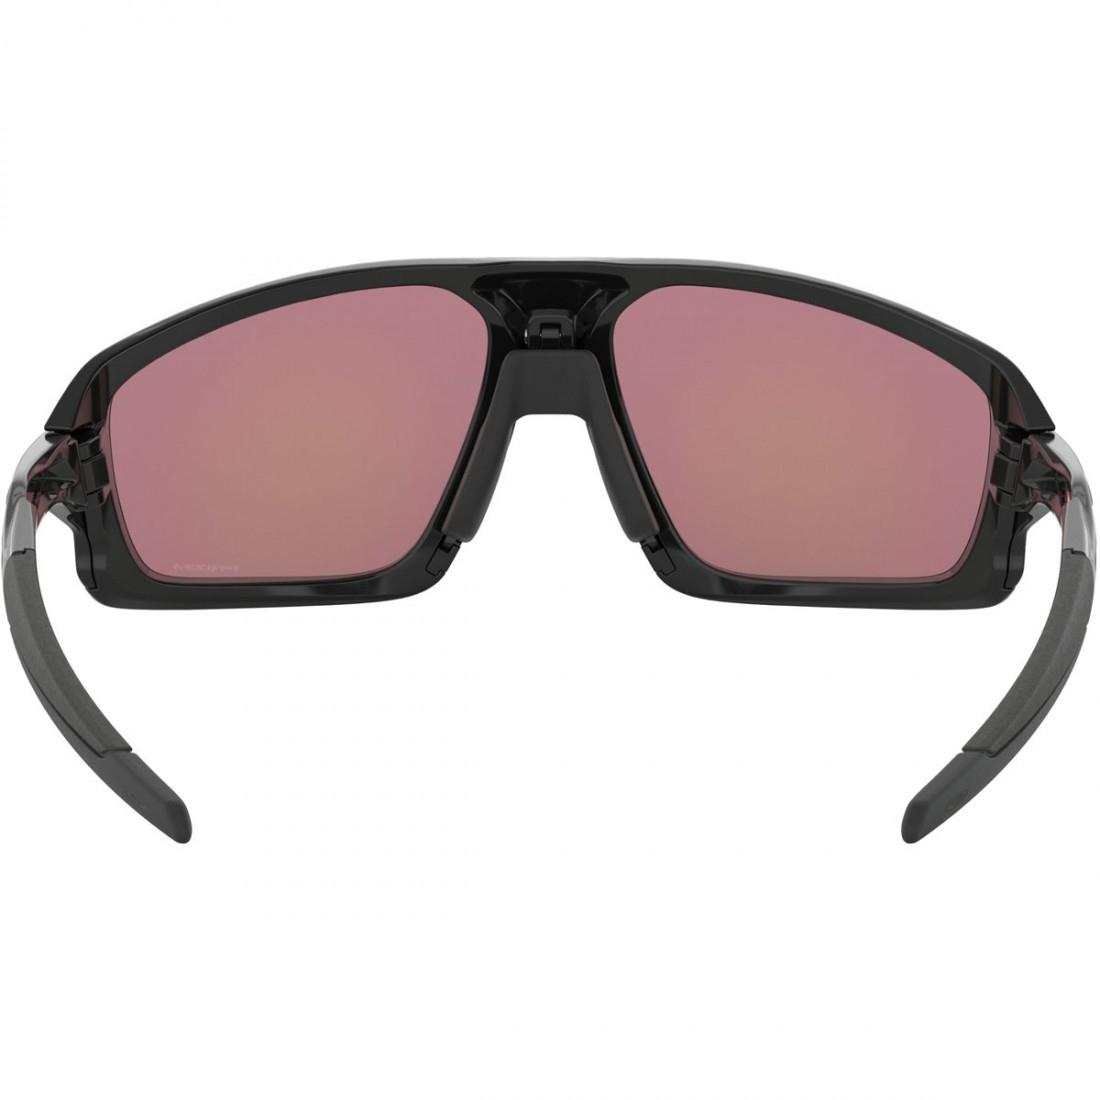 ee545003d3 Máscara / Gafas OAKLEY Field Jacket Polished Black / Prizm Road ...